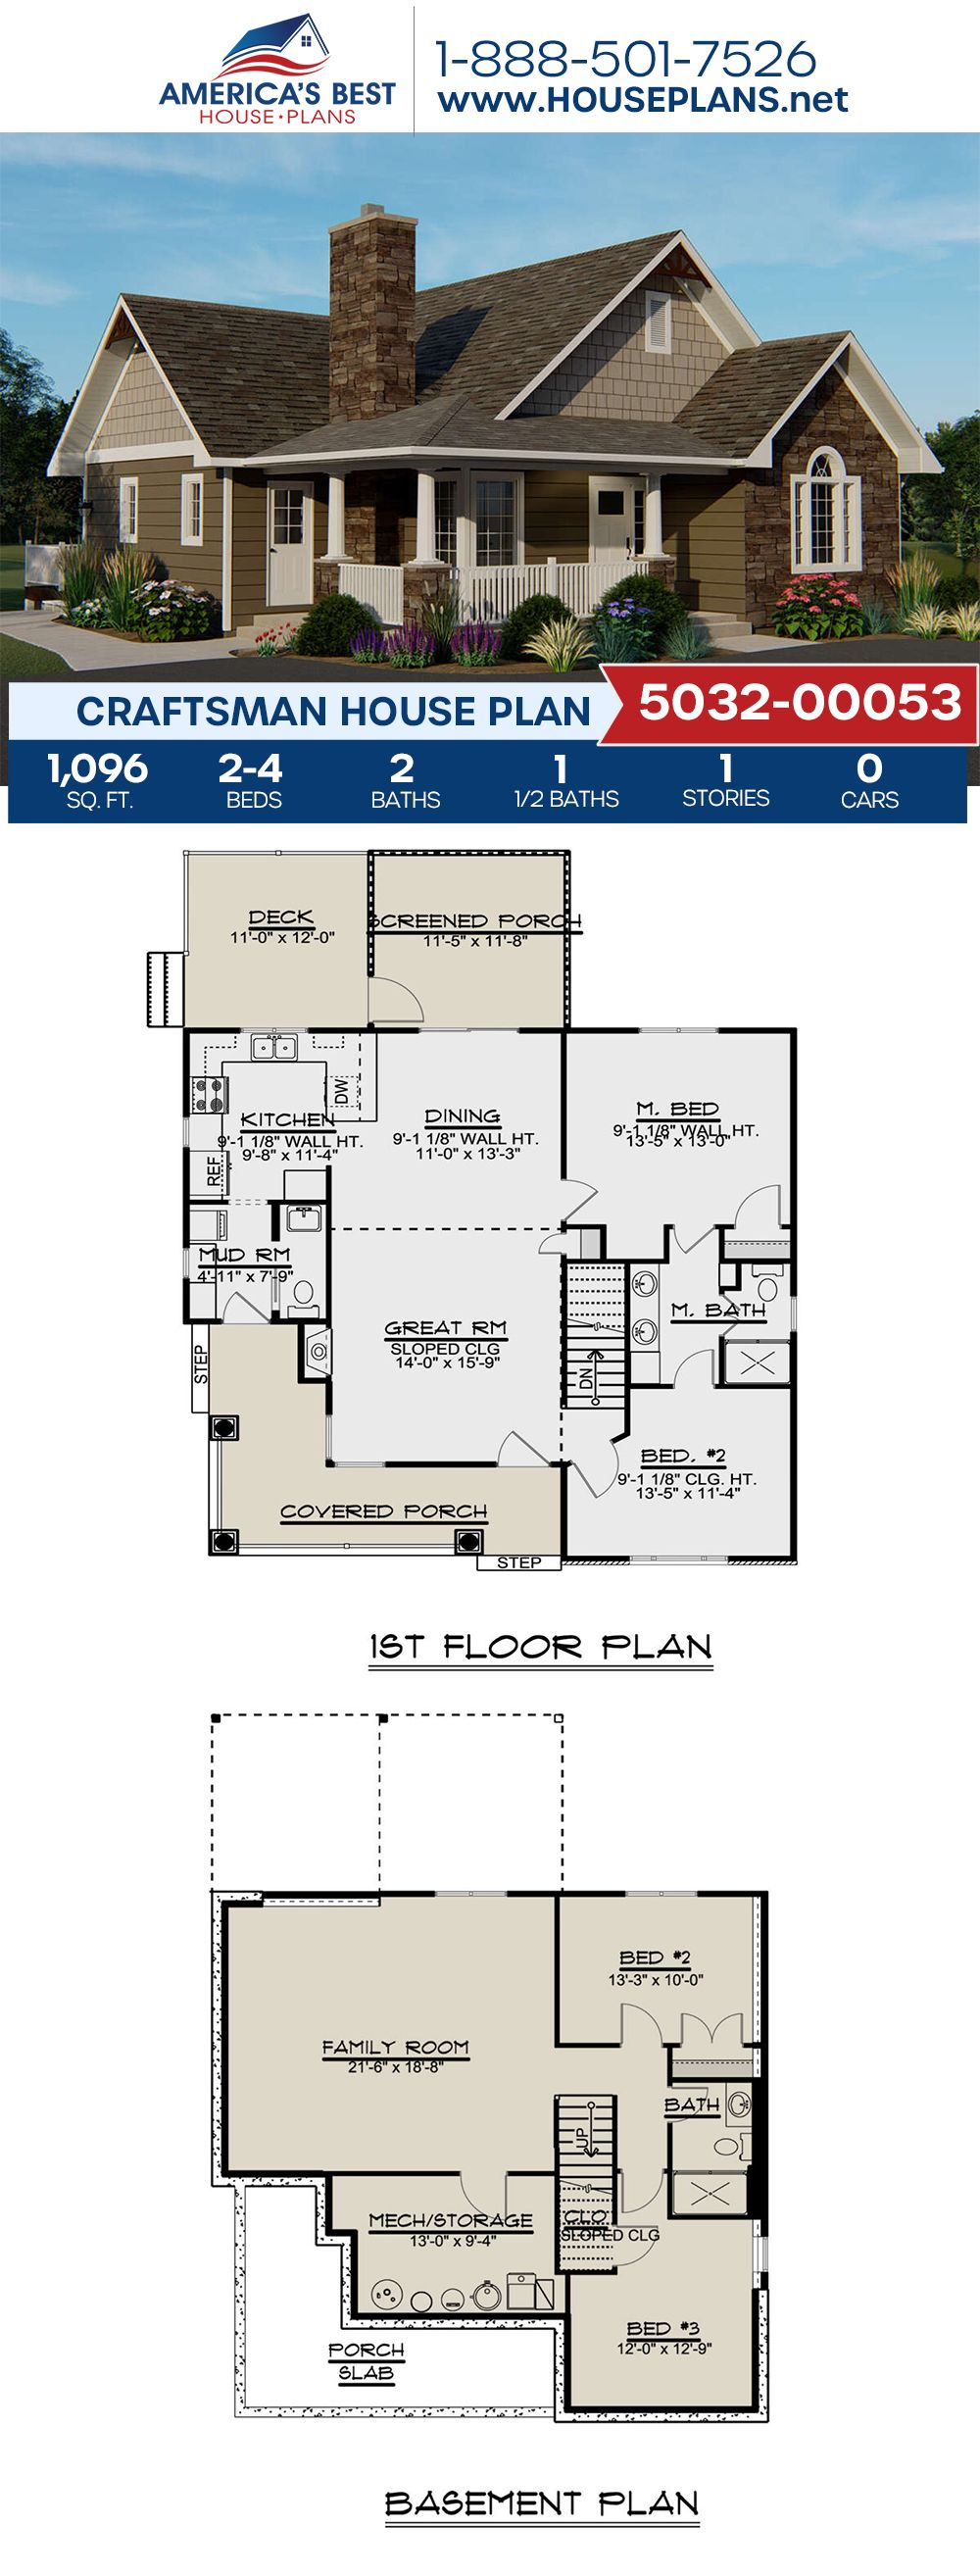 House Plan 5032 00053 Craftsman Plan 1 096 Square Feet 2 Bedrooms 2 5 Bathrooms Beach House Floor Plans Craftsman House House Plans Farmhouse